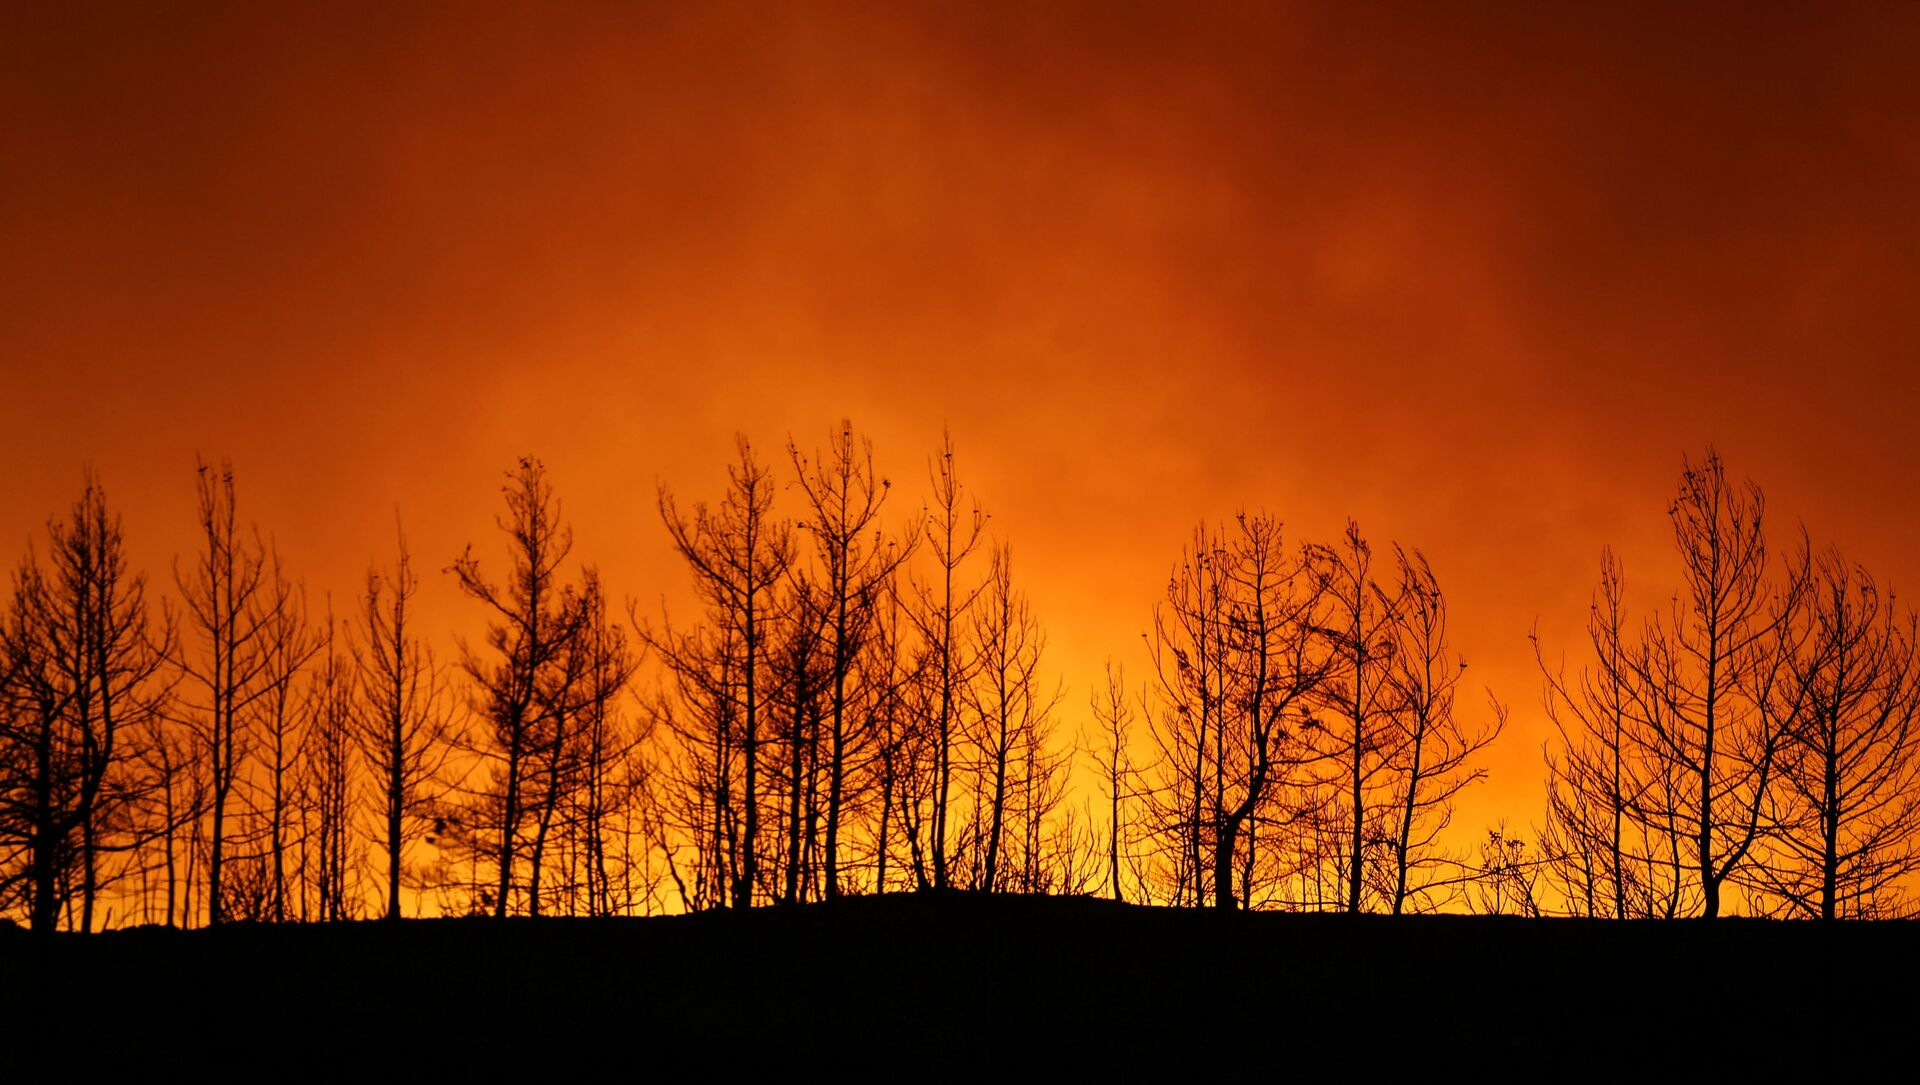 A forest fire burns near the town of Manavgat, east of the resort city of Antalya, Turkey, July 29, 2021. REUTERS/Kaan Soyturk - Sputnik International, 1920, 30.07.2021